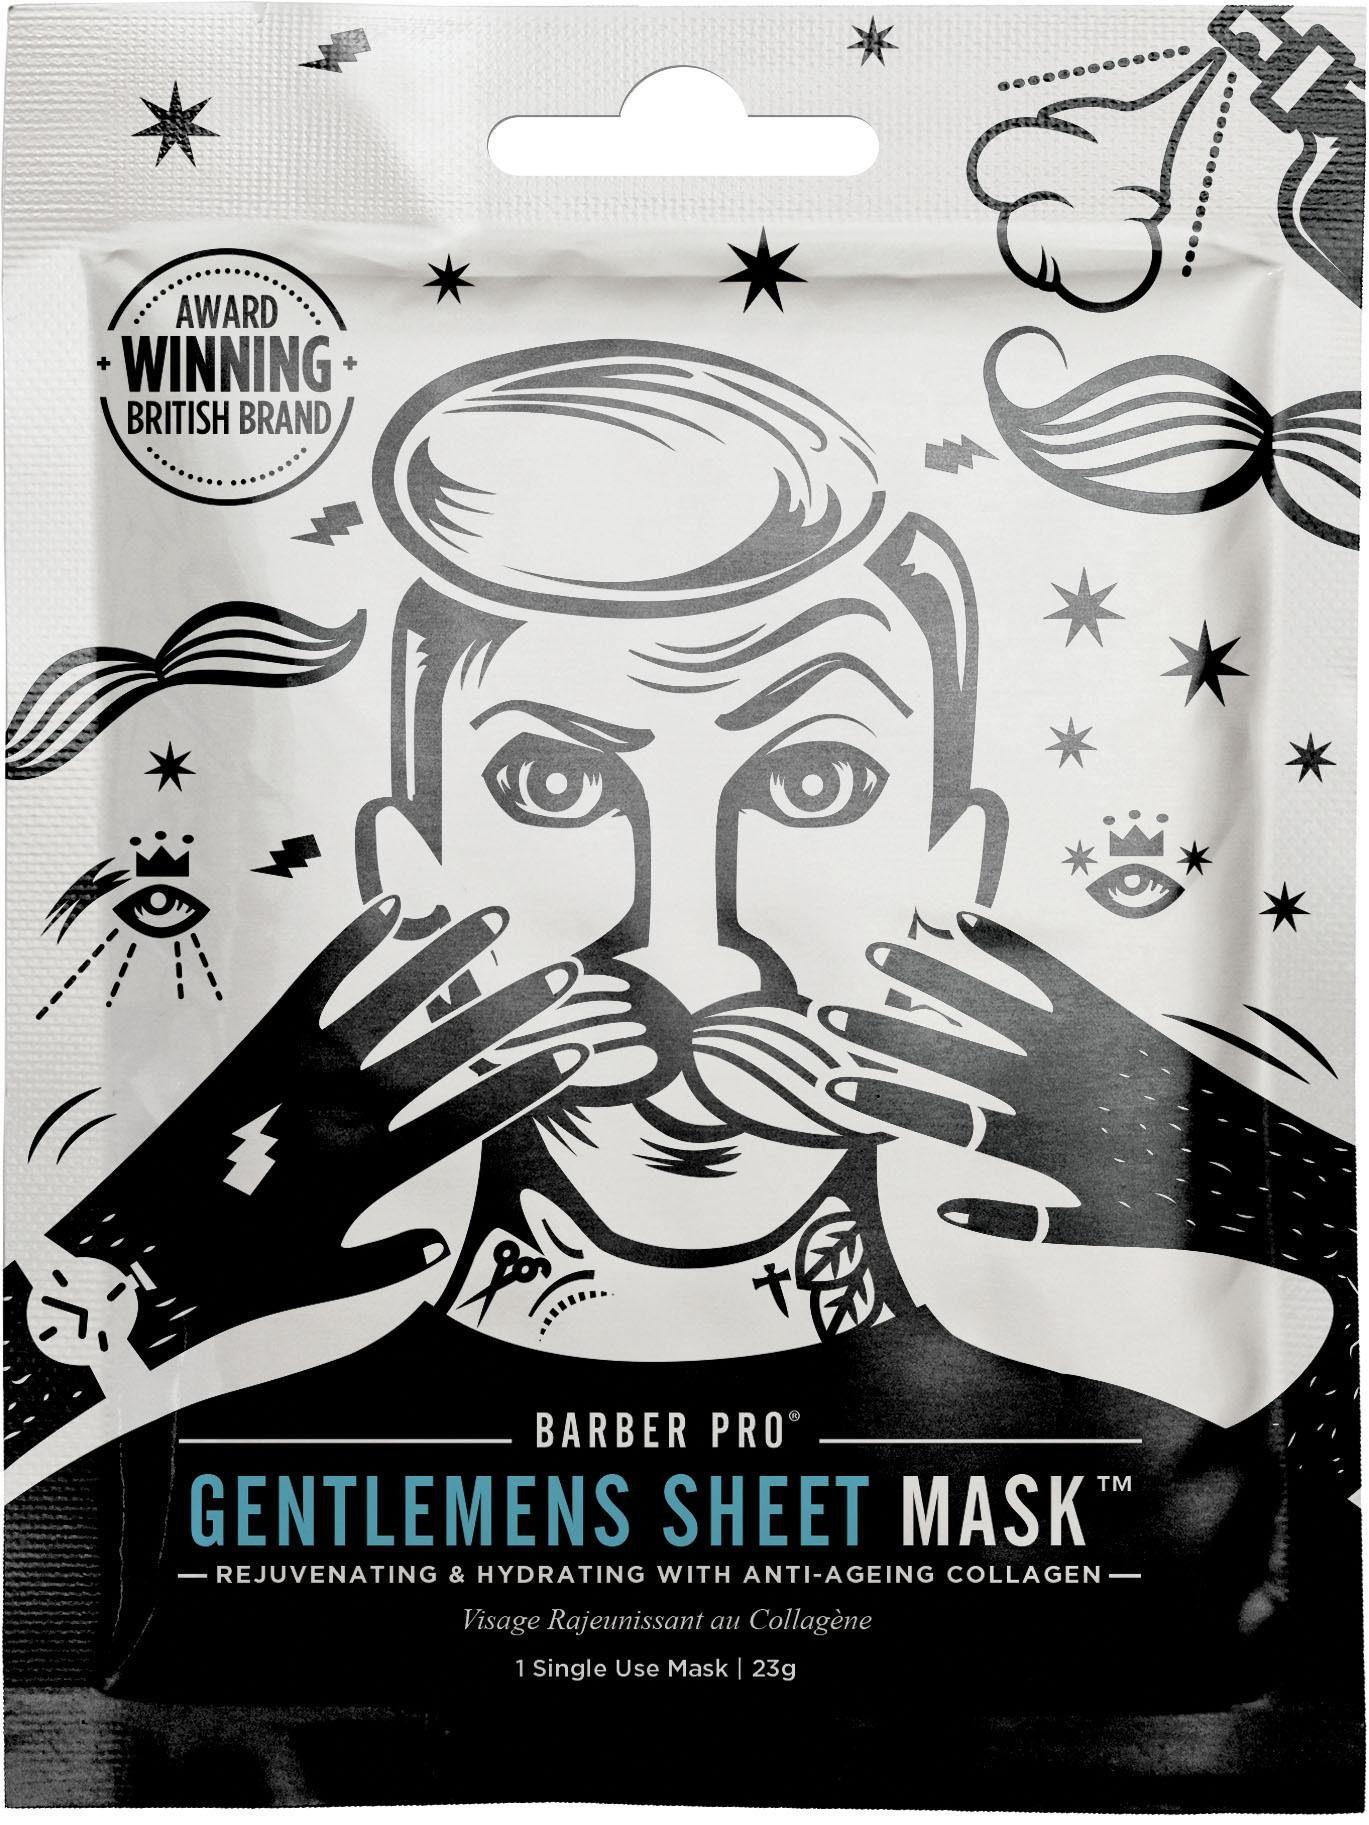 BARBER PRO, »GENTLEMEN'S SHEET MASK™«, Pflege und anti-aging Maske